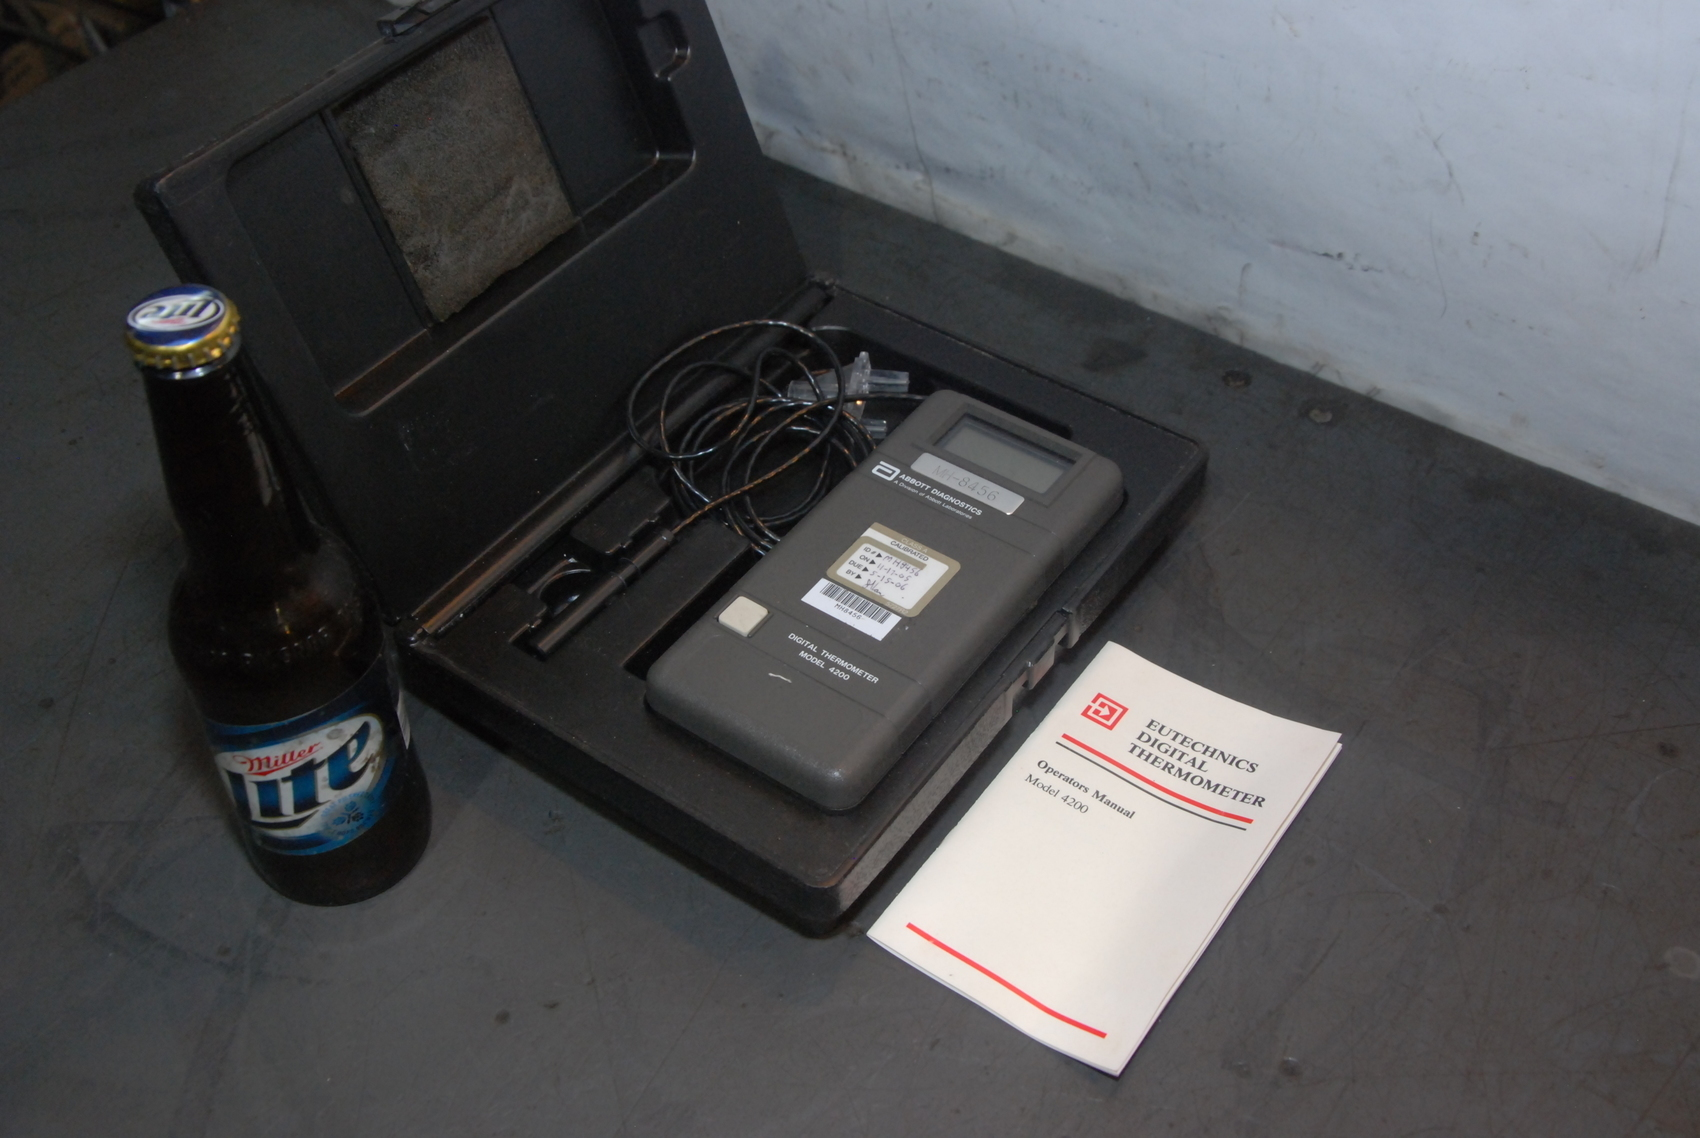 ABBOTT DIAGNOSTICS DIGITAL THERMOMETER W/CASE,MODEL 4200